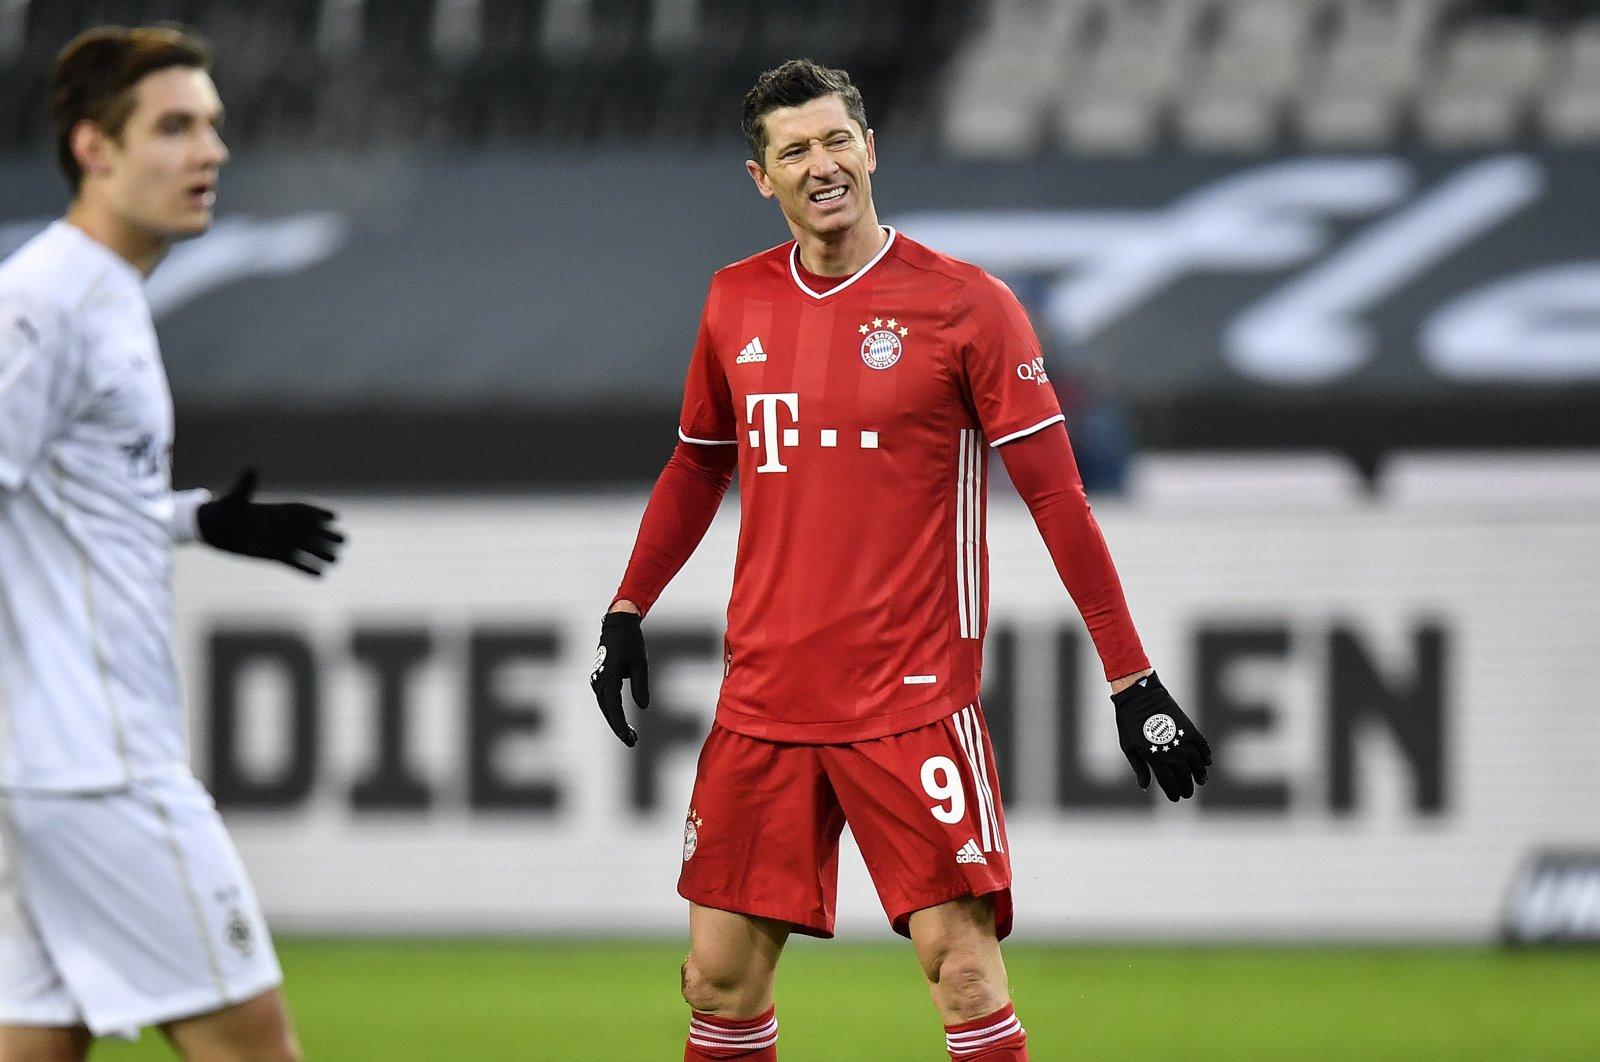 Bayern's Robert Lewandowski reacts disappointedly during a Bundesliga match against Borussia Monchengladbach at Borussia Park, in Monchengladbach, Germany, Jan. 8, 2021. (AP Photo)